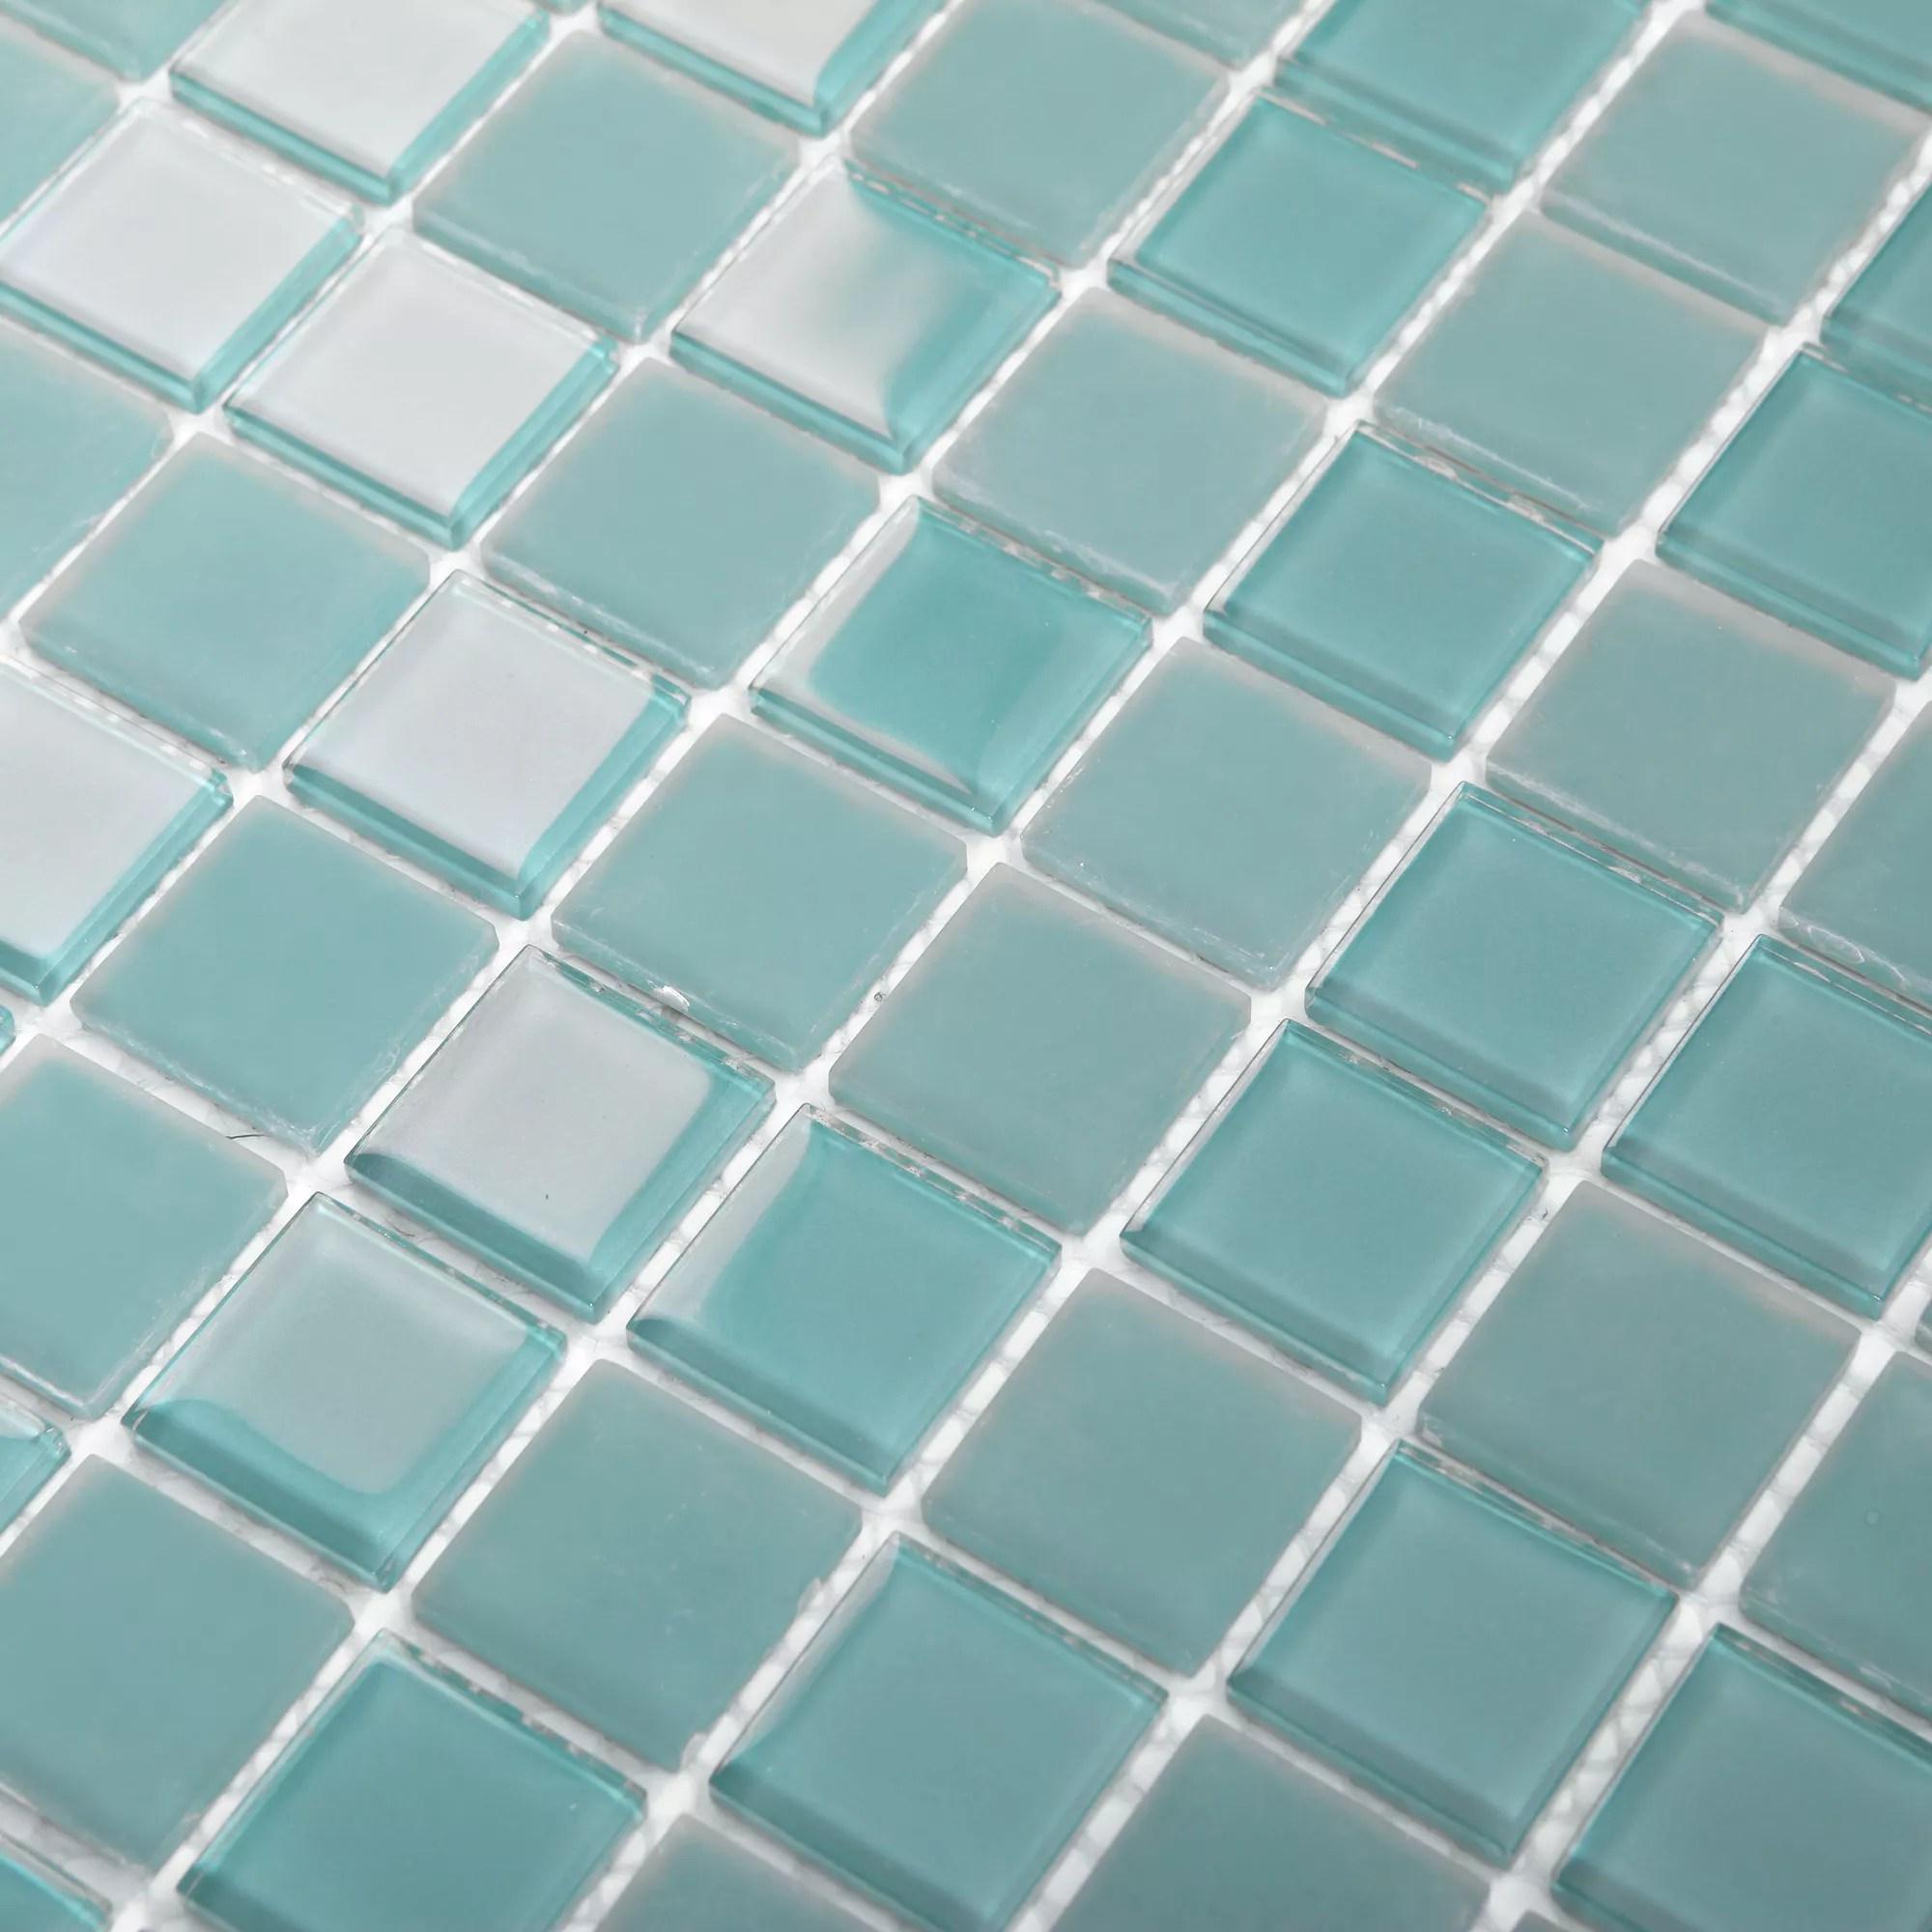 glina blue glass mosaic tile sheets l 300mm w 300mm